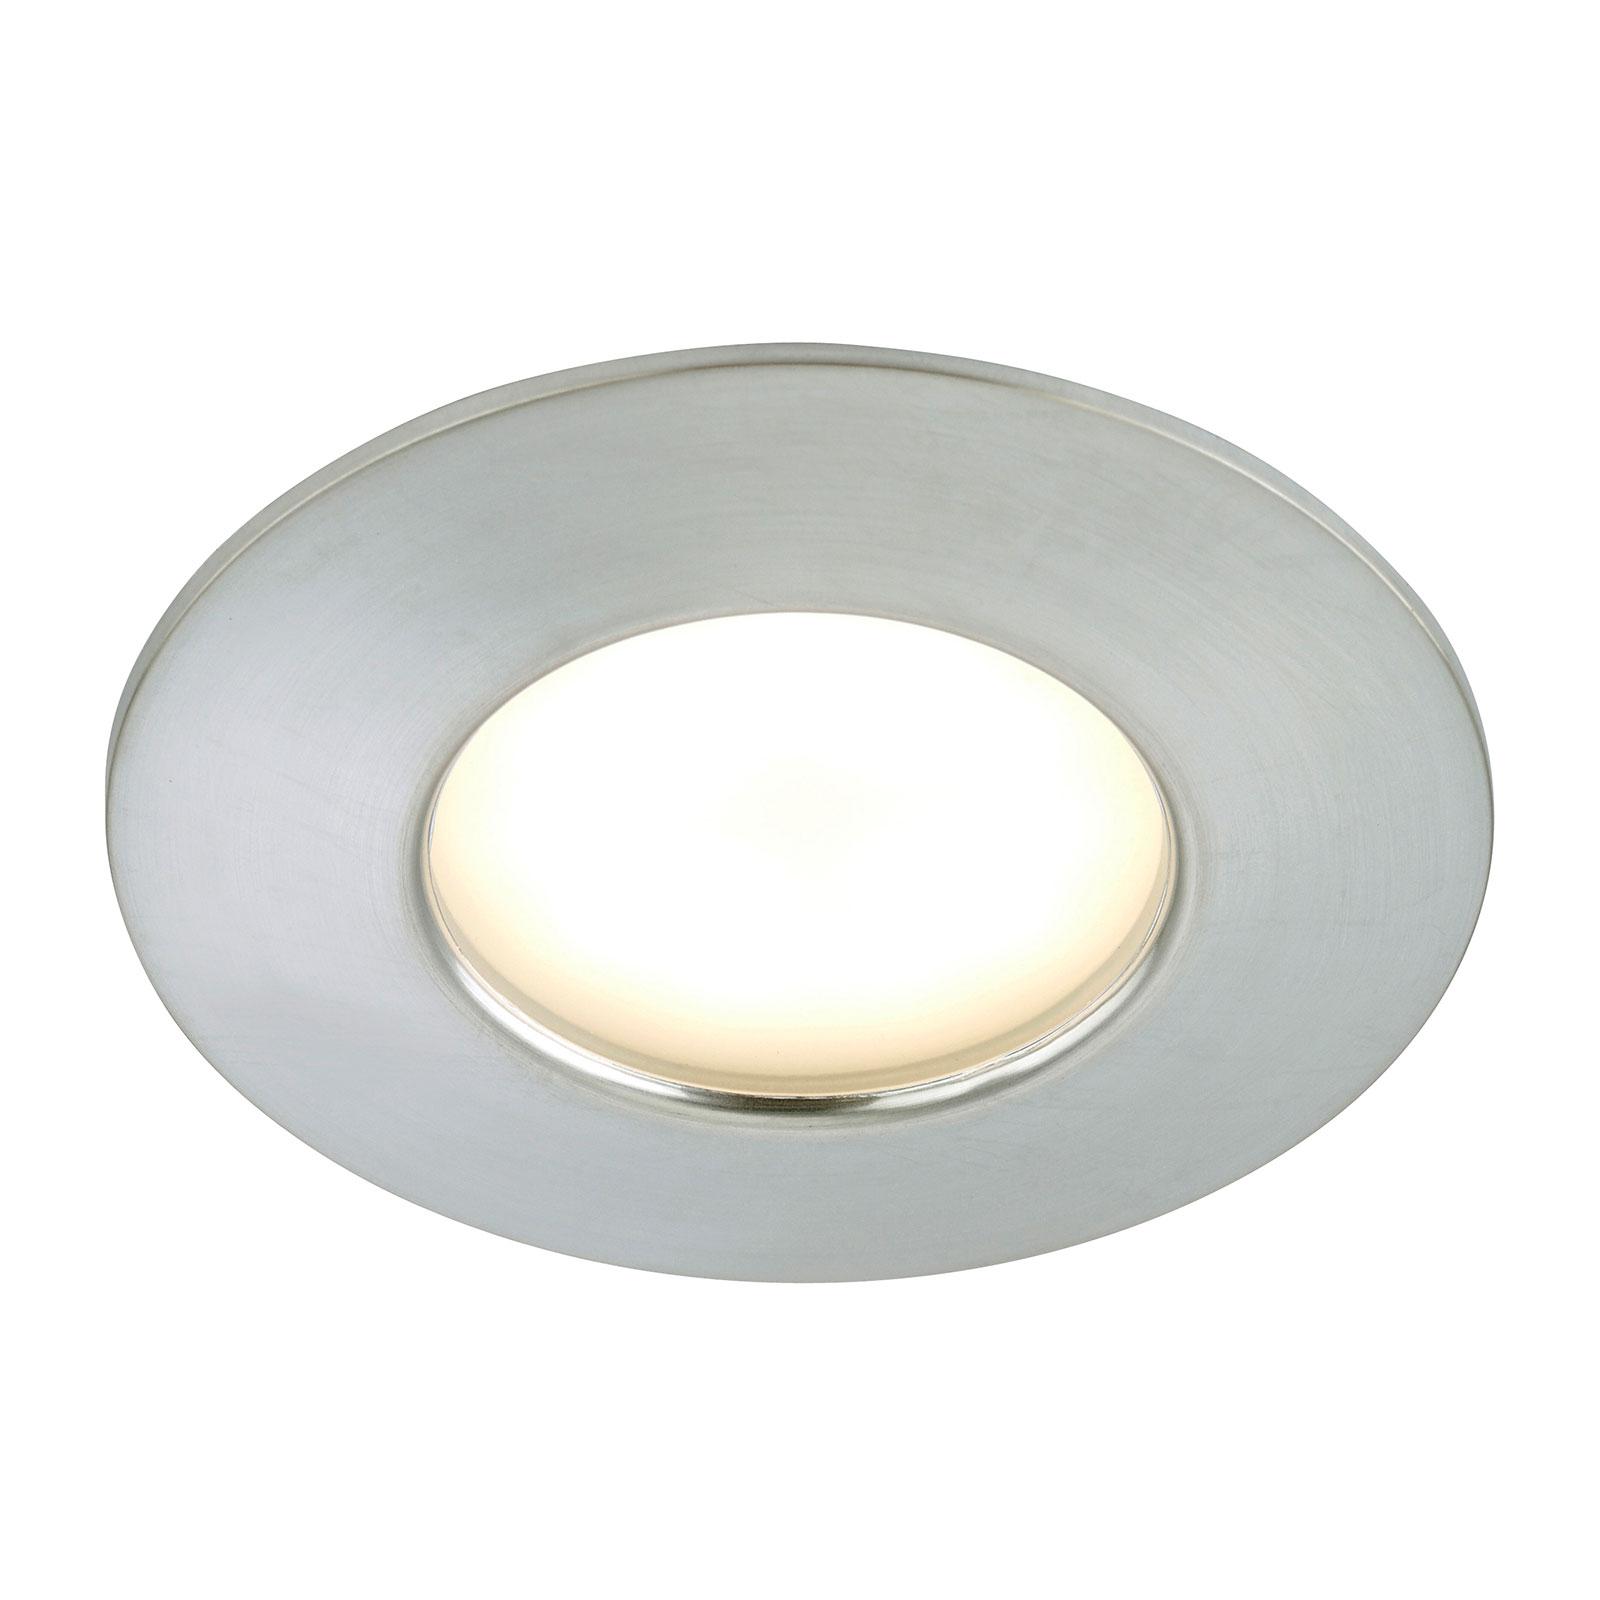 Felia alufarvet LED indbygningslampe, IP44